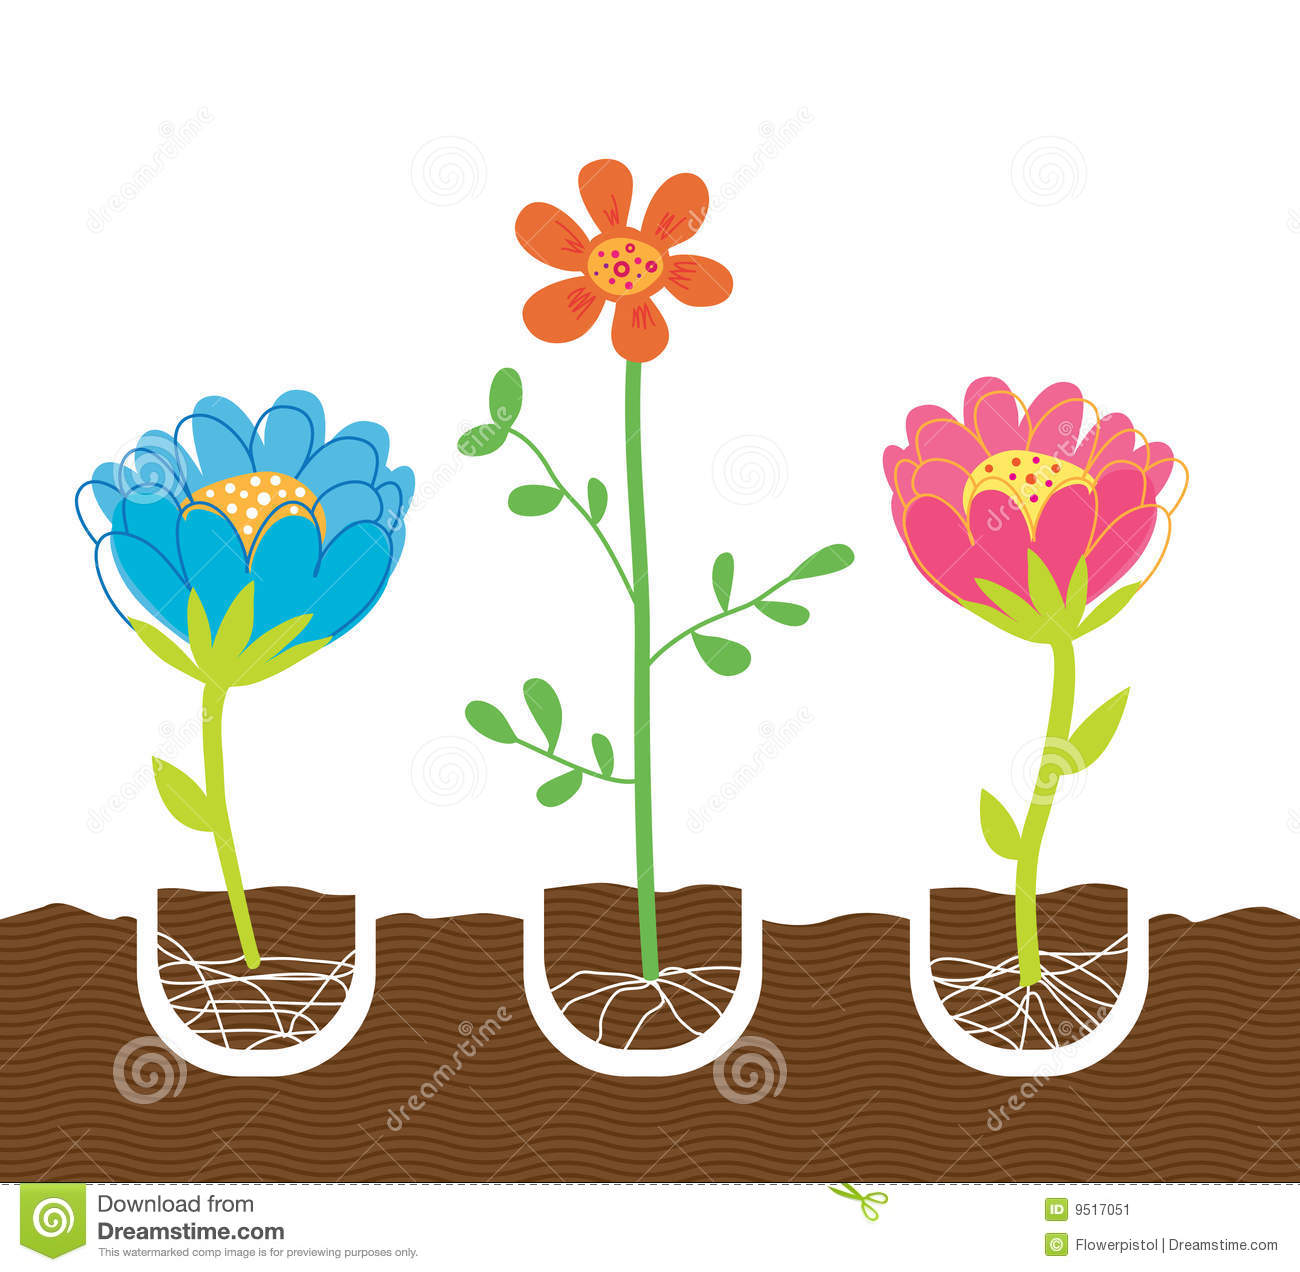 Planting Flowers Stock Image   Image  9517051